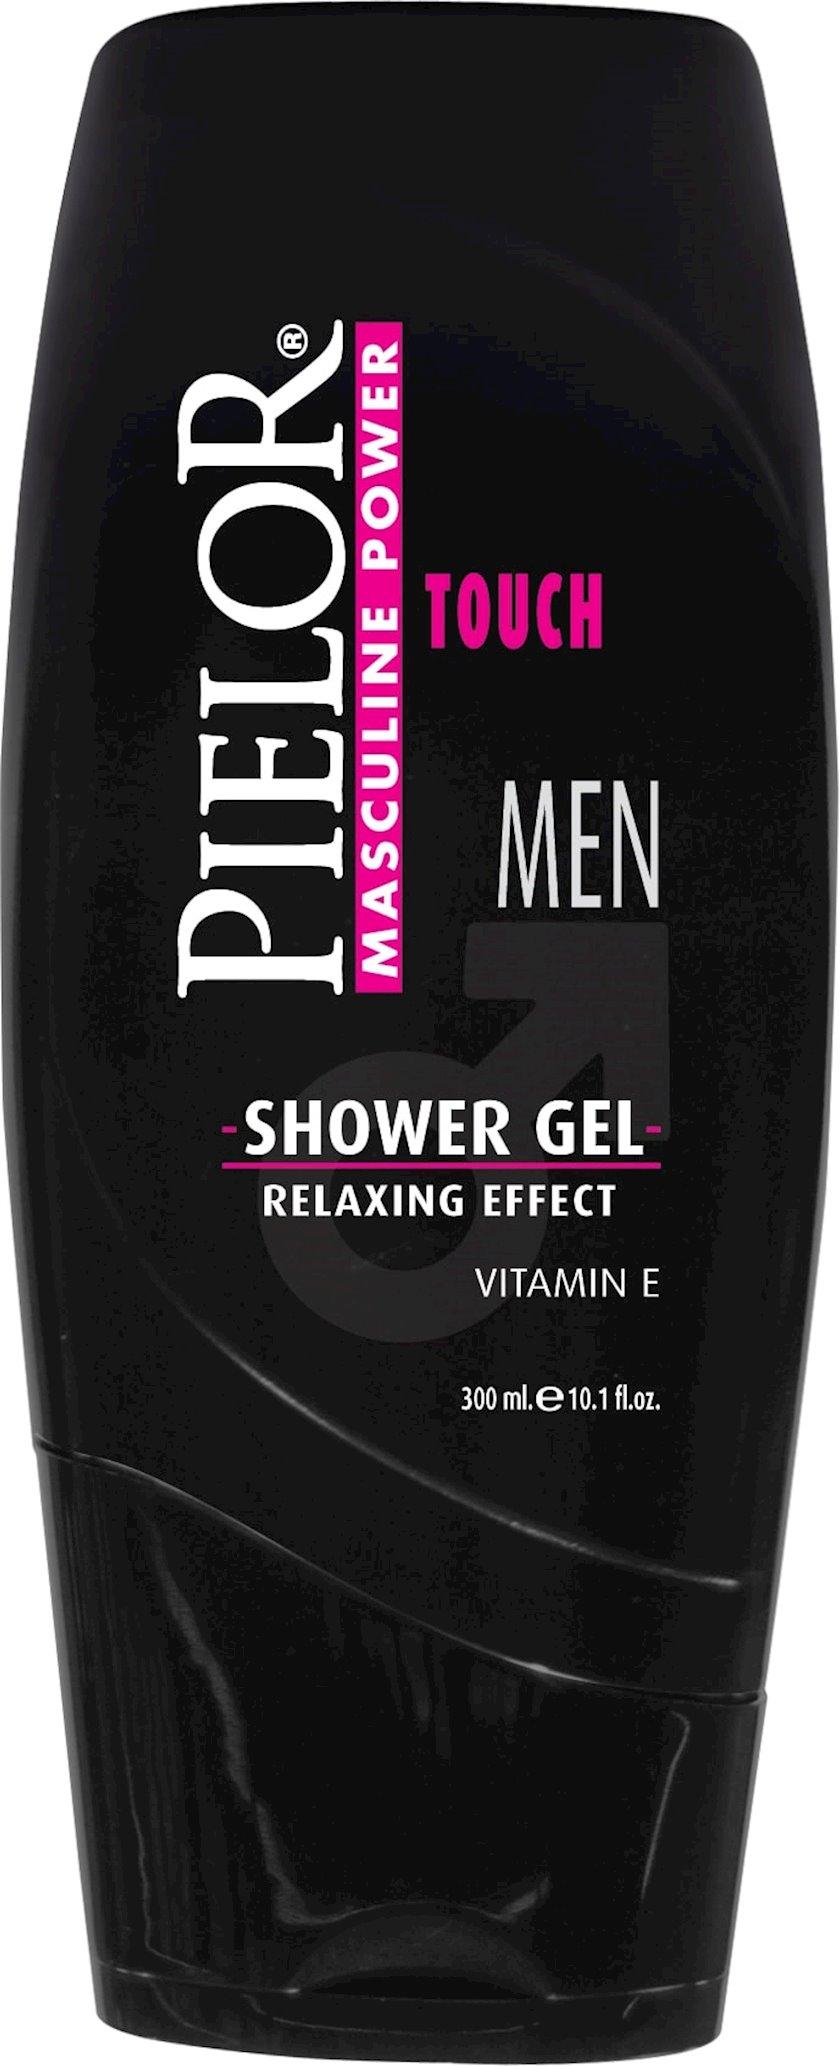 Duş geli Pielor Touch, 300 ml